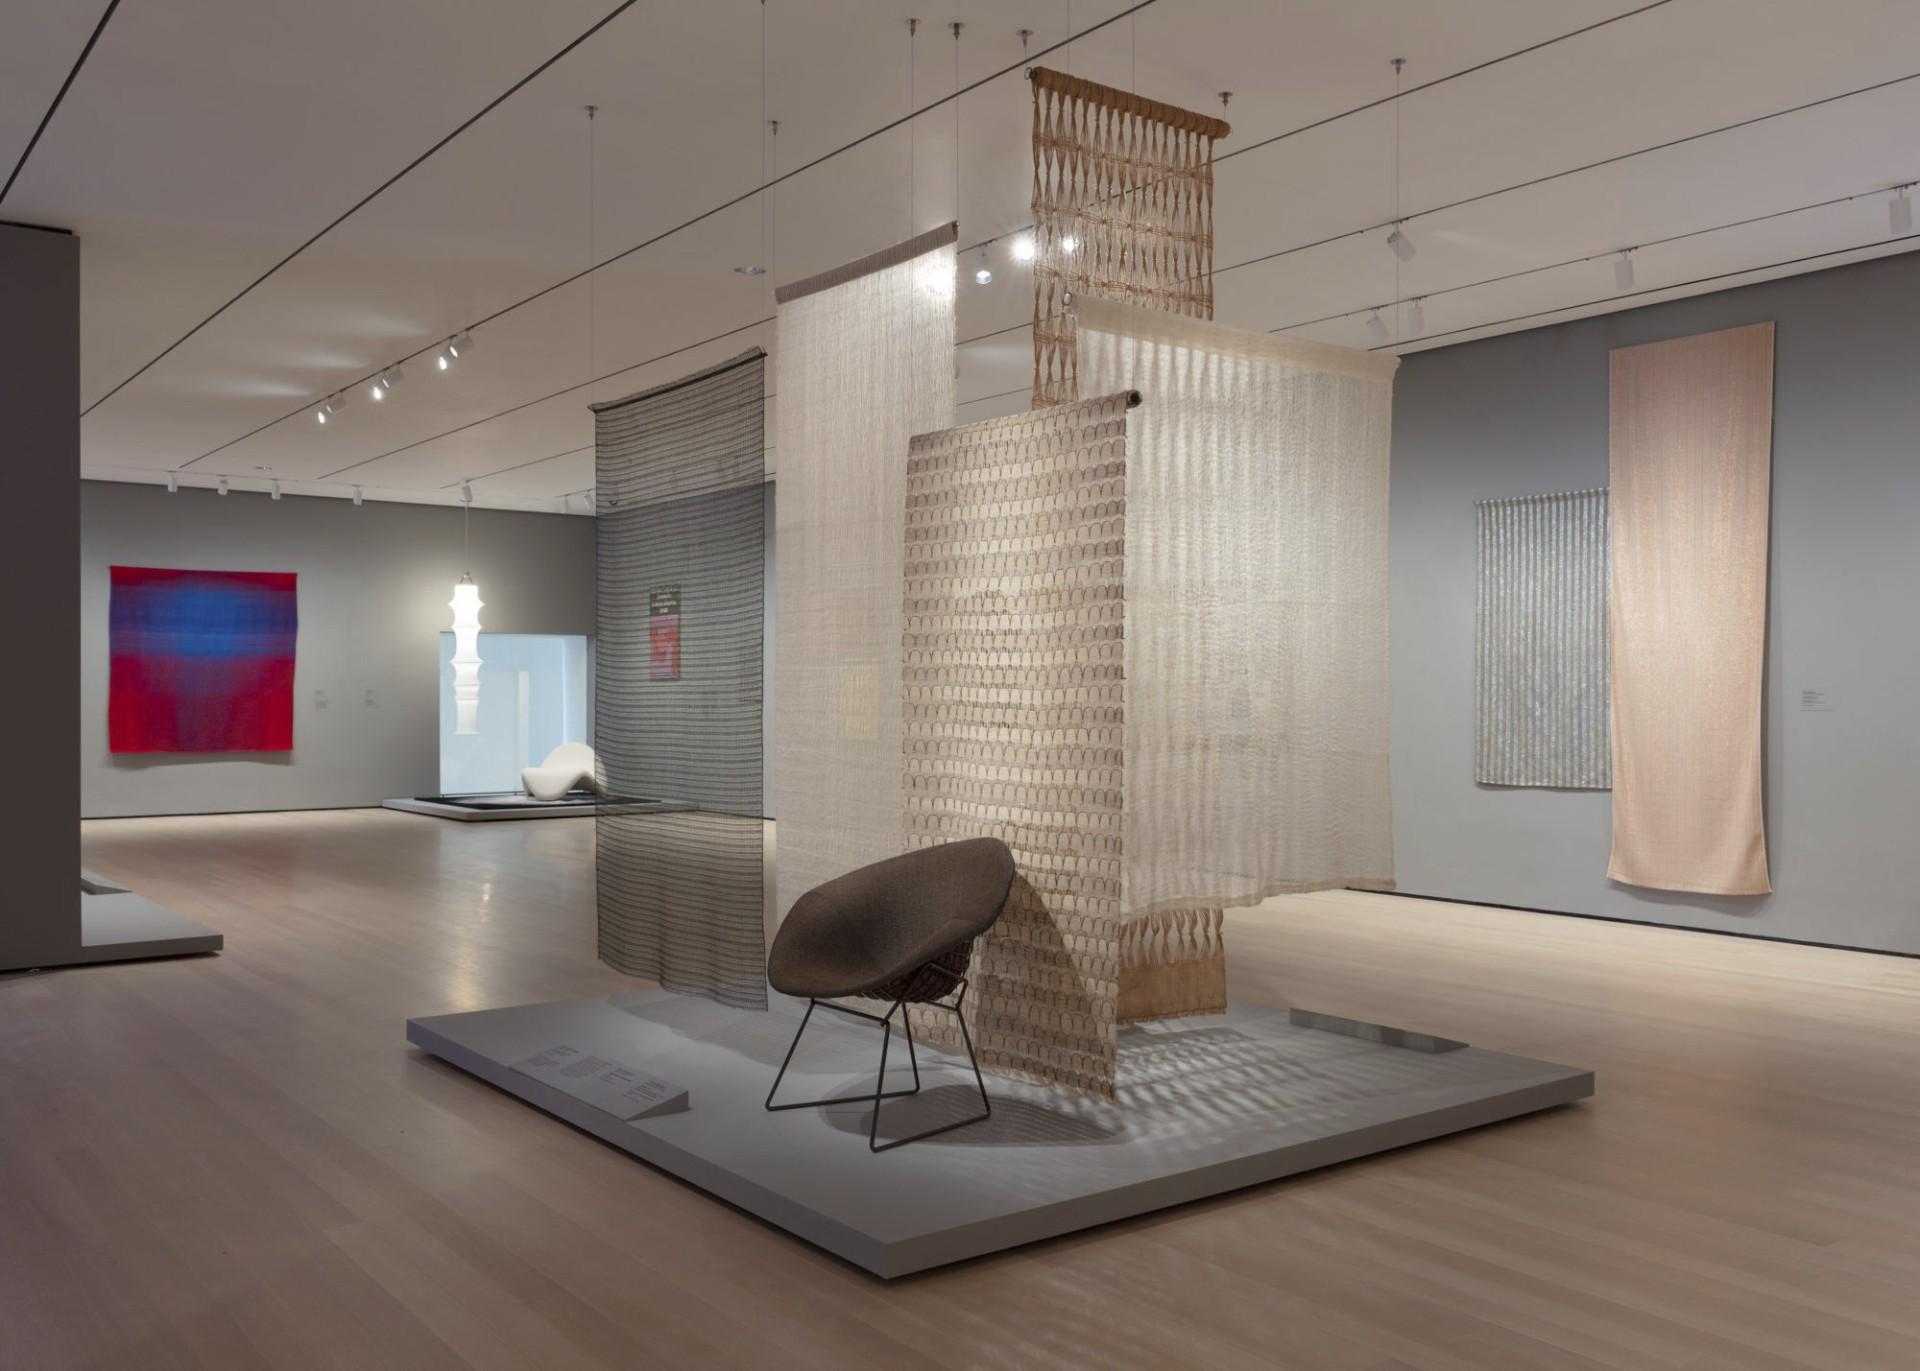 1969 Wall Hangings Museum Of Modern Art